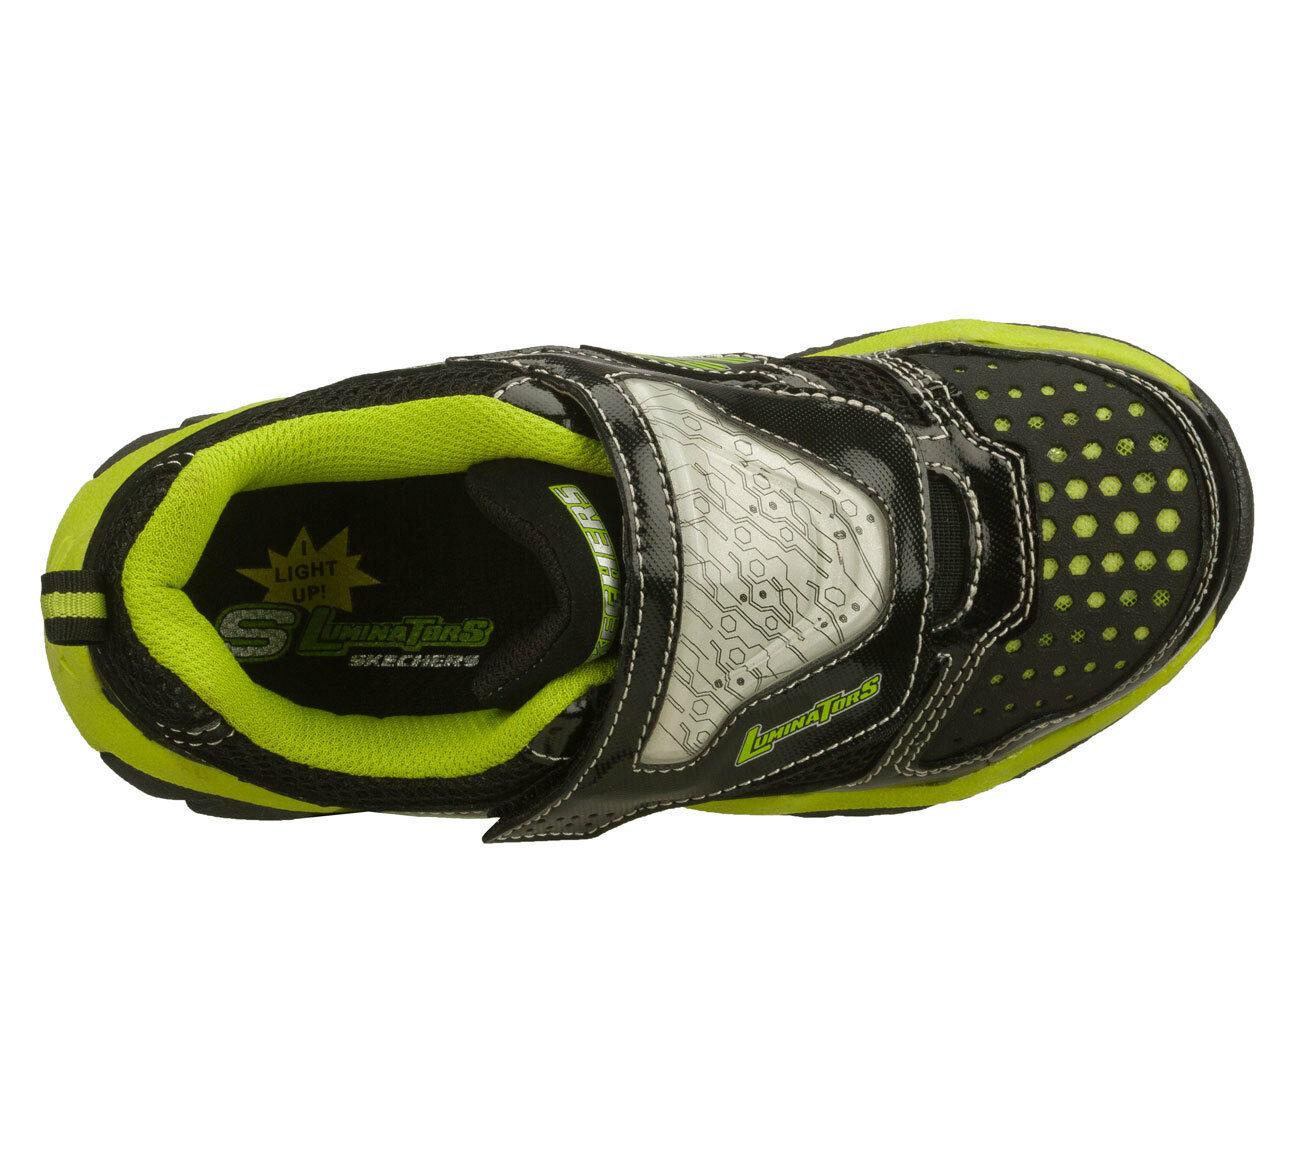 Skechers S-LIGHTS Luminators Si Illumina Athletic Scarpe Sneakers Nwt Youth 2 $ image 4